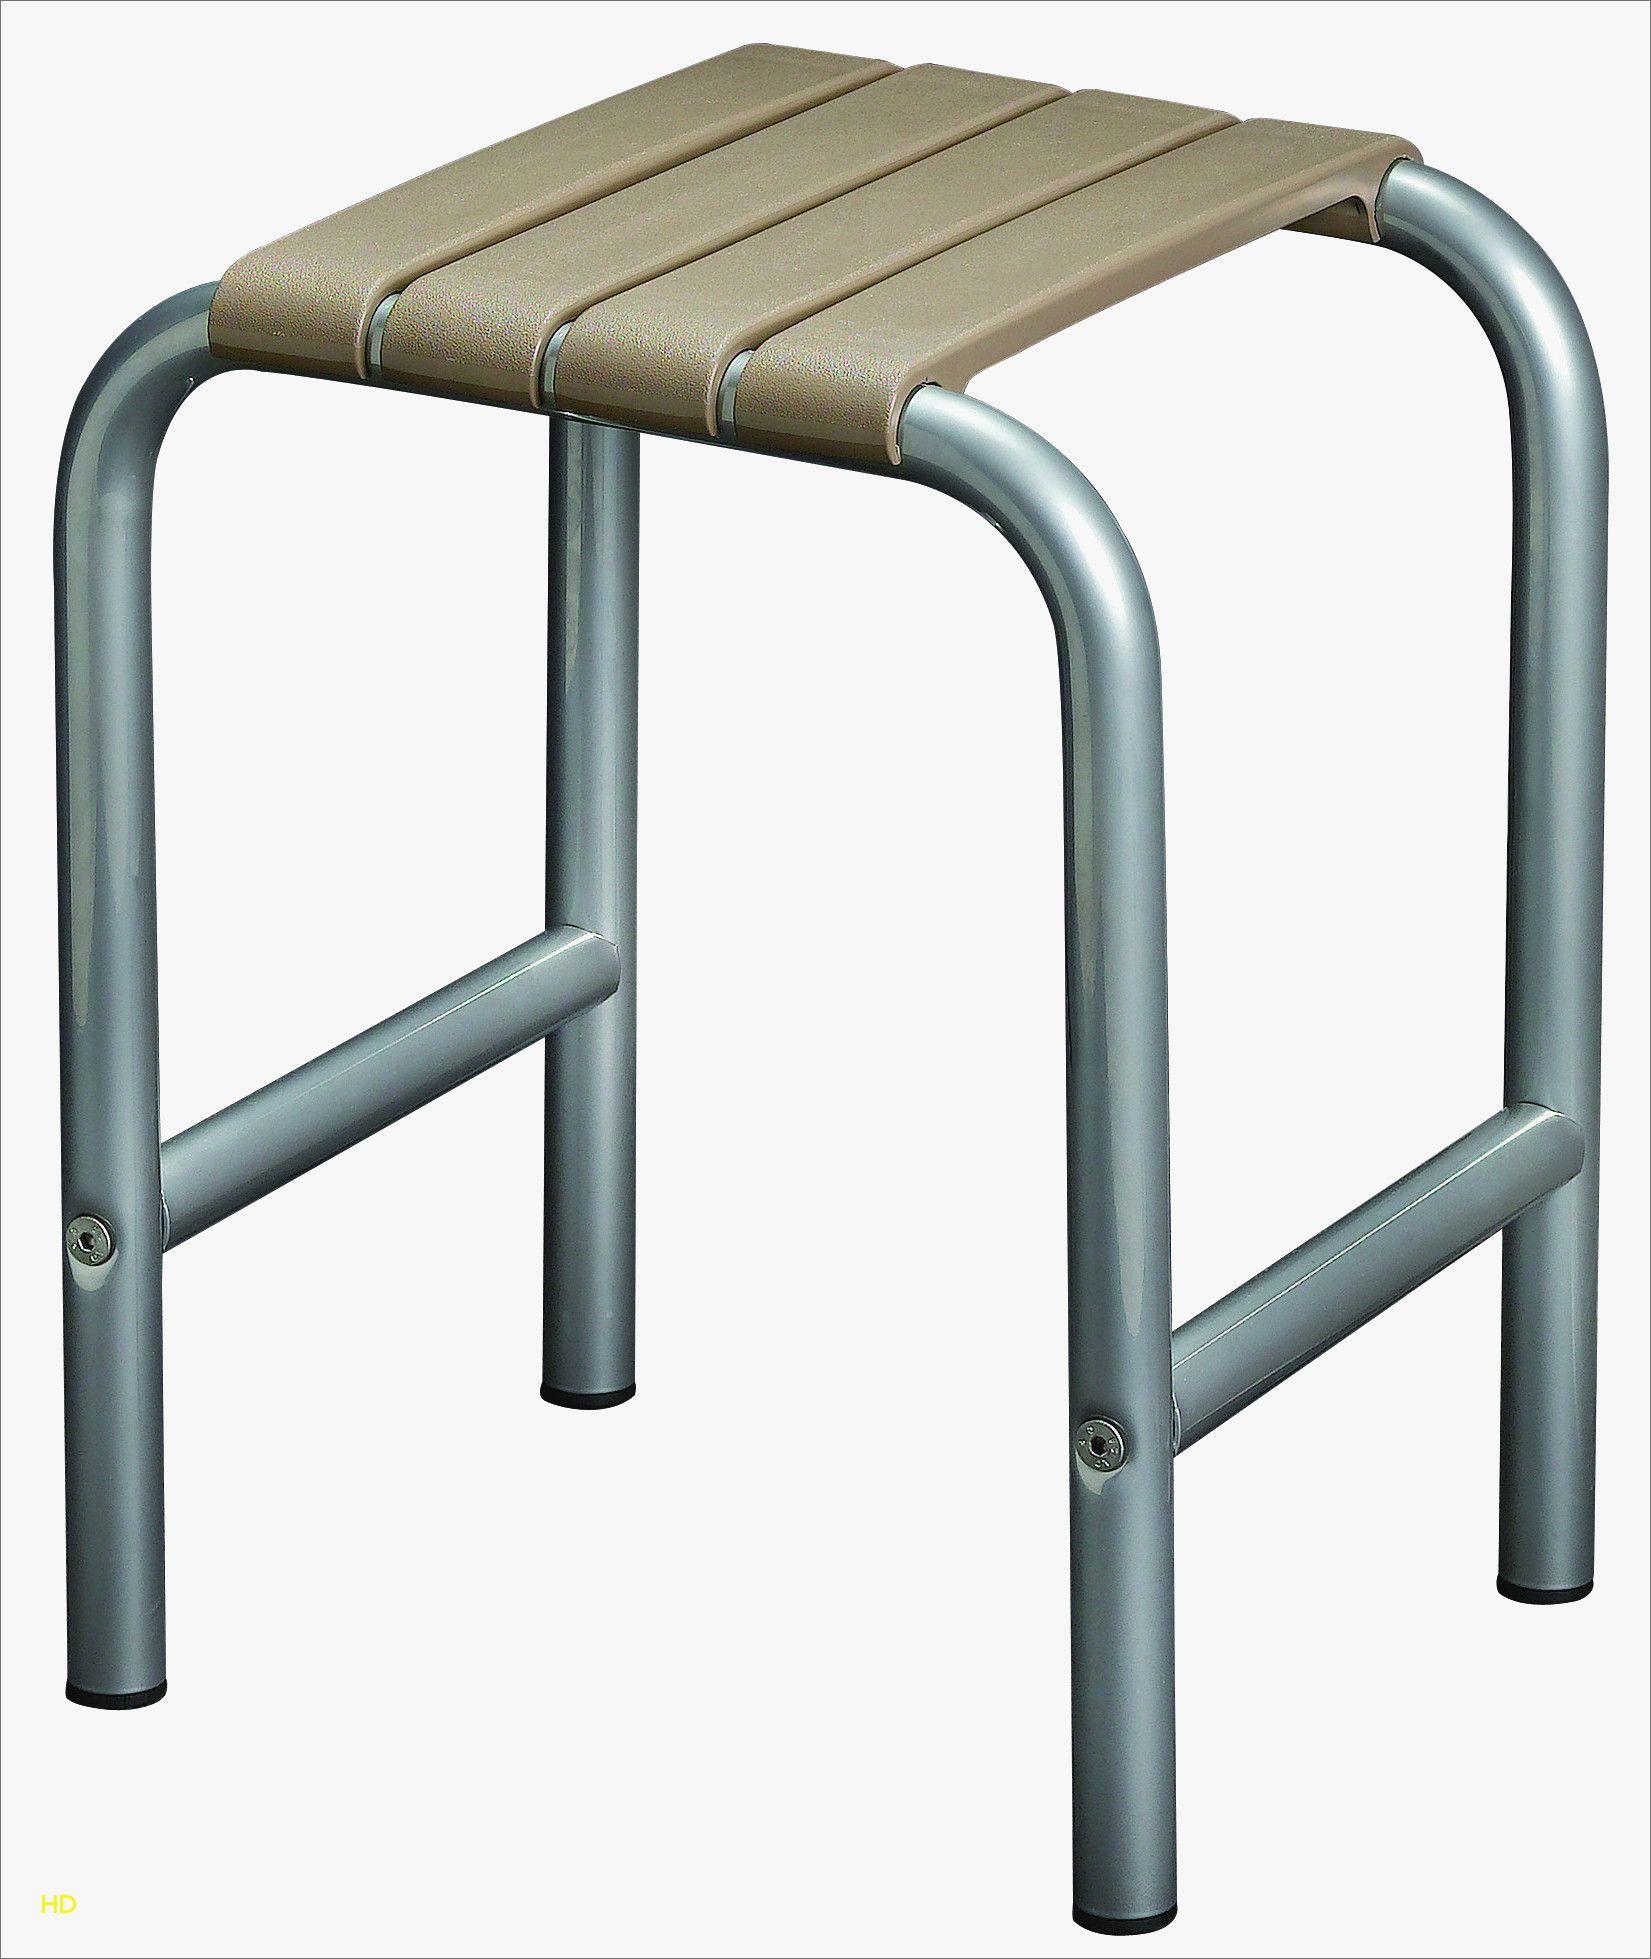 Inspirant Chaise De Douche Invacare Idees Inspirantes Chaise De Bar Zons Chaise De Bureau Usag E Chaise De Bureau Yaounde Chaise Bar Chaise Cuisine Chaise